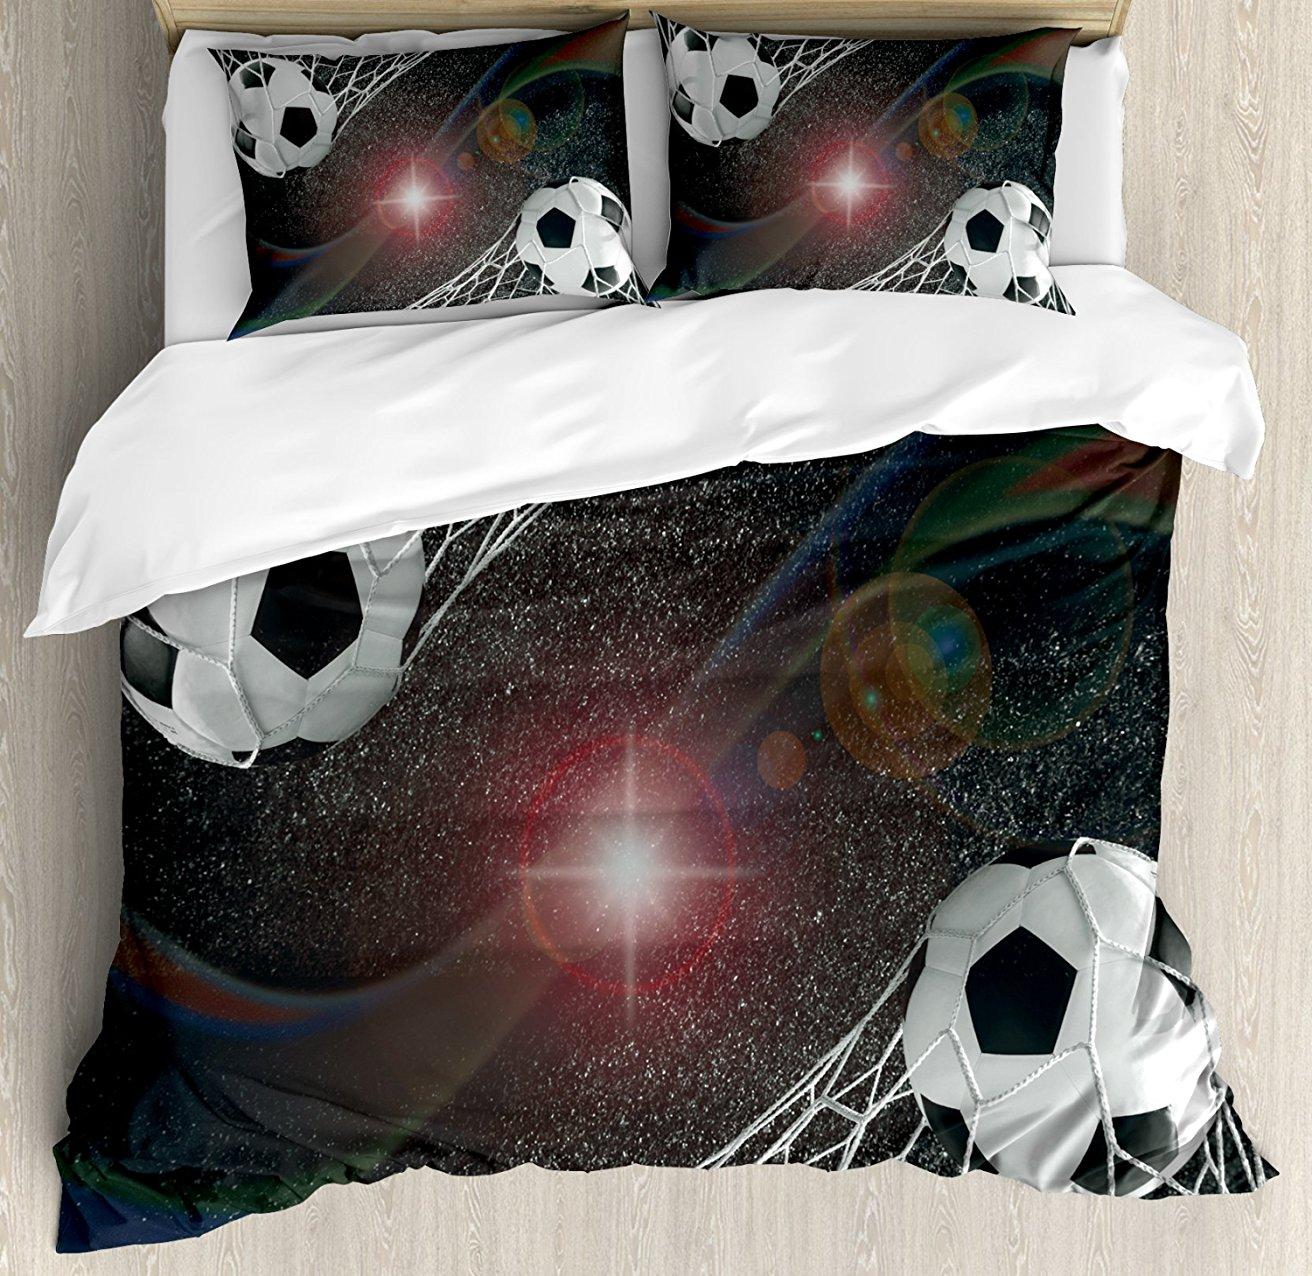 Decor Duvet Cover Set Soccer Balls Goal Match Success Concept in Outer Space Winner Glory Theme, 4 Piece Bedding Set